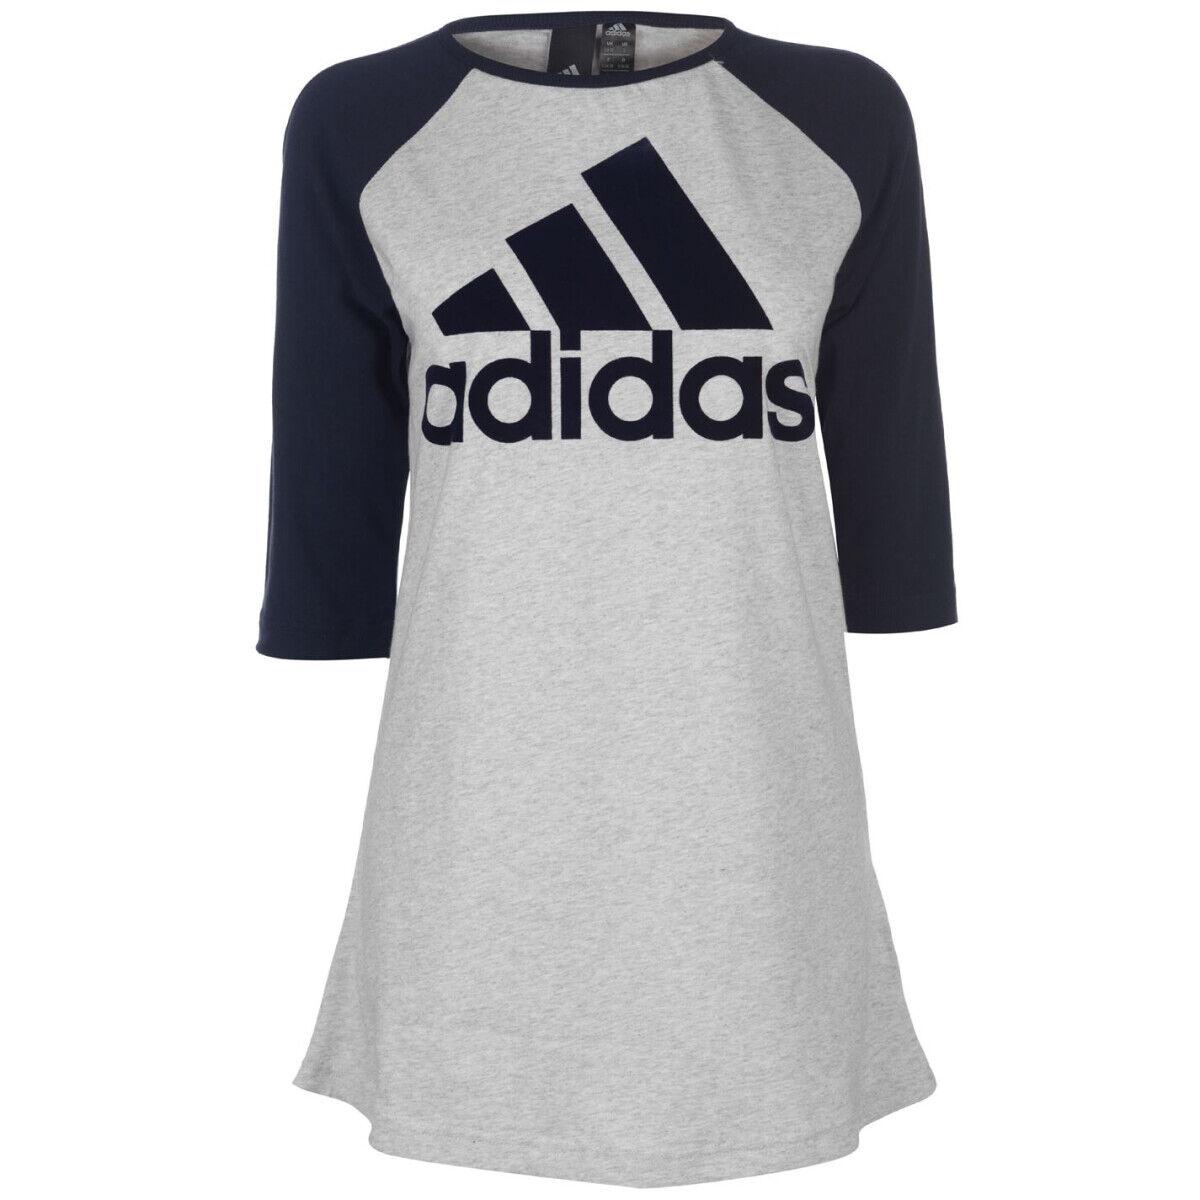 Adidas daSie T-Shirt T Shirt Tshirt Short Sleeve Top Jogging Fitness 3187